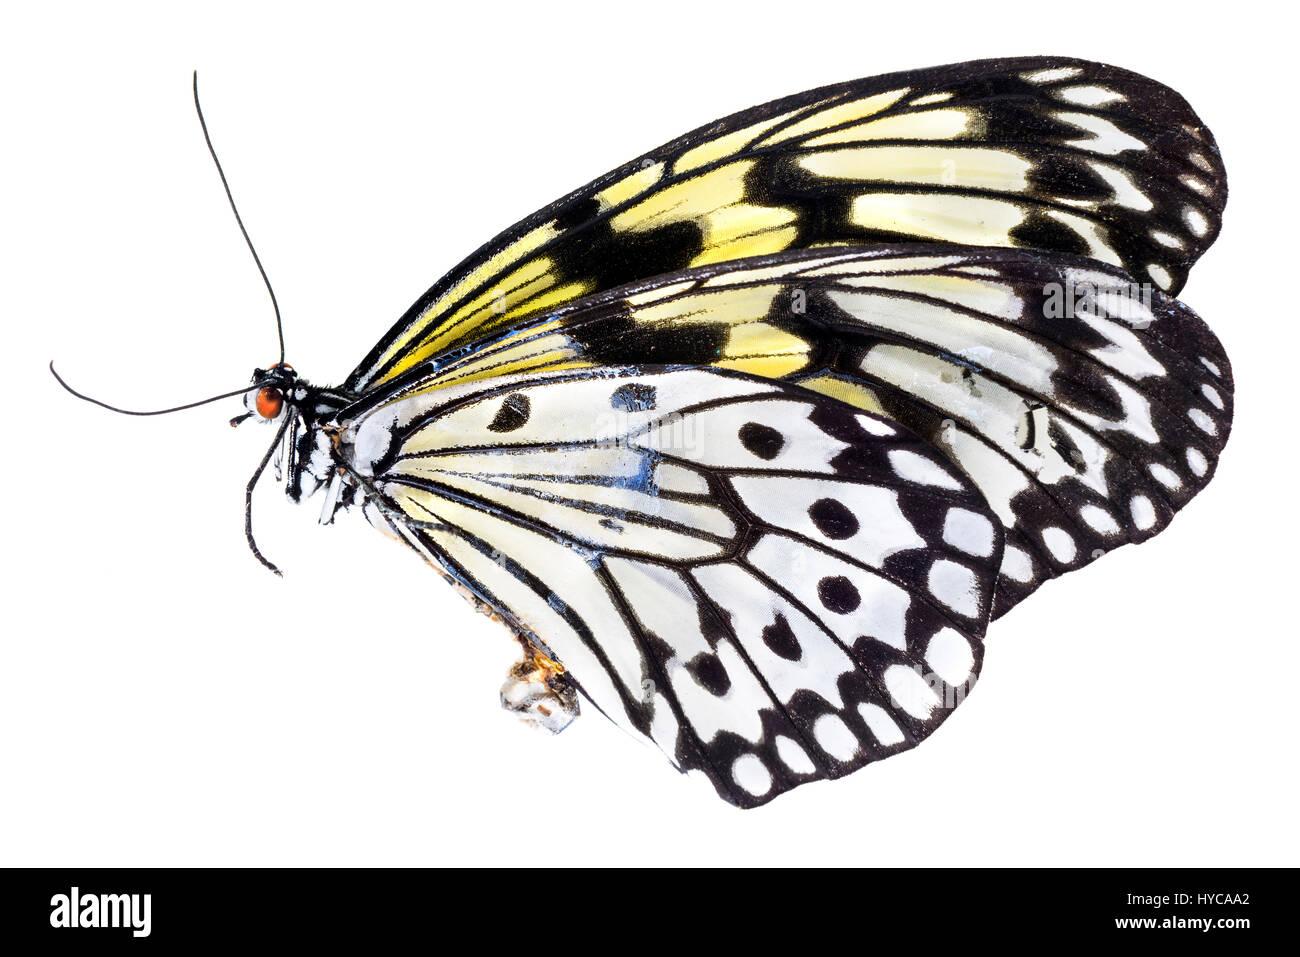 Malabar tree nymph butterfly (Idea malabarica) - Stock Image